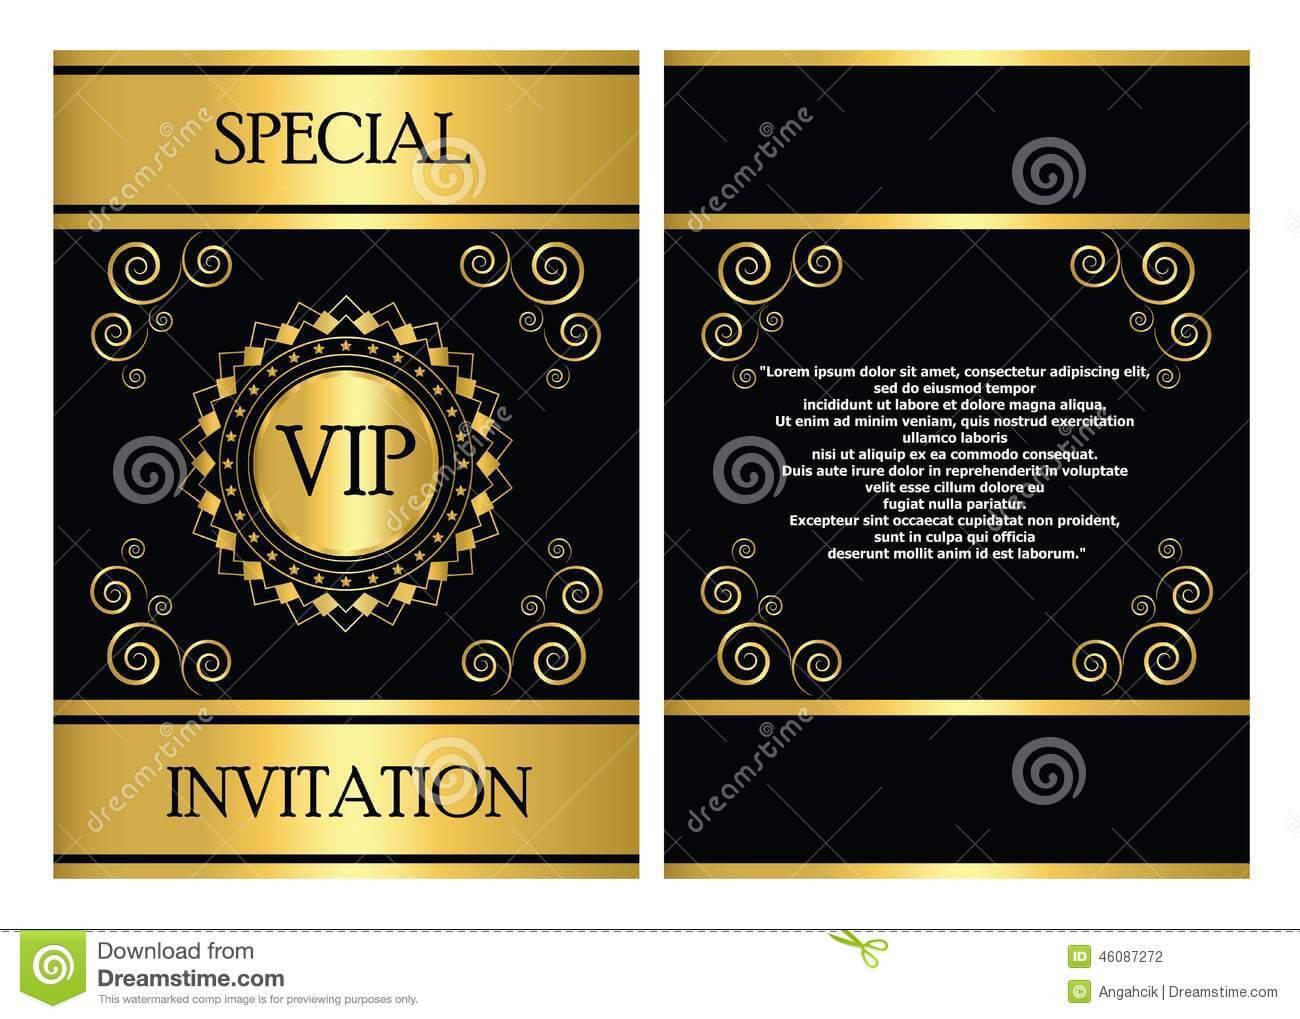 Vip Invitation Card Template Stock Vector – Illustration Of Within Event Invitation Card Template